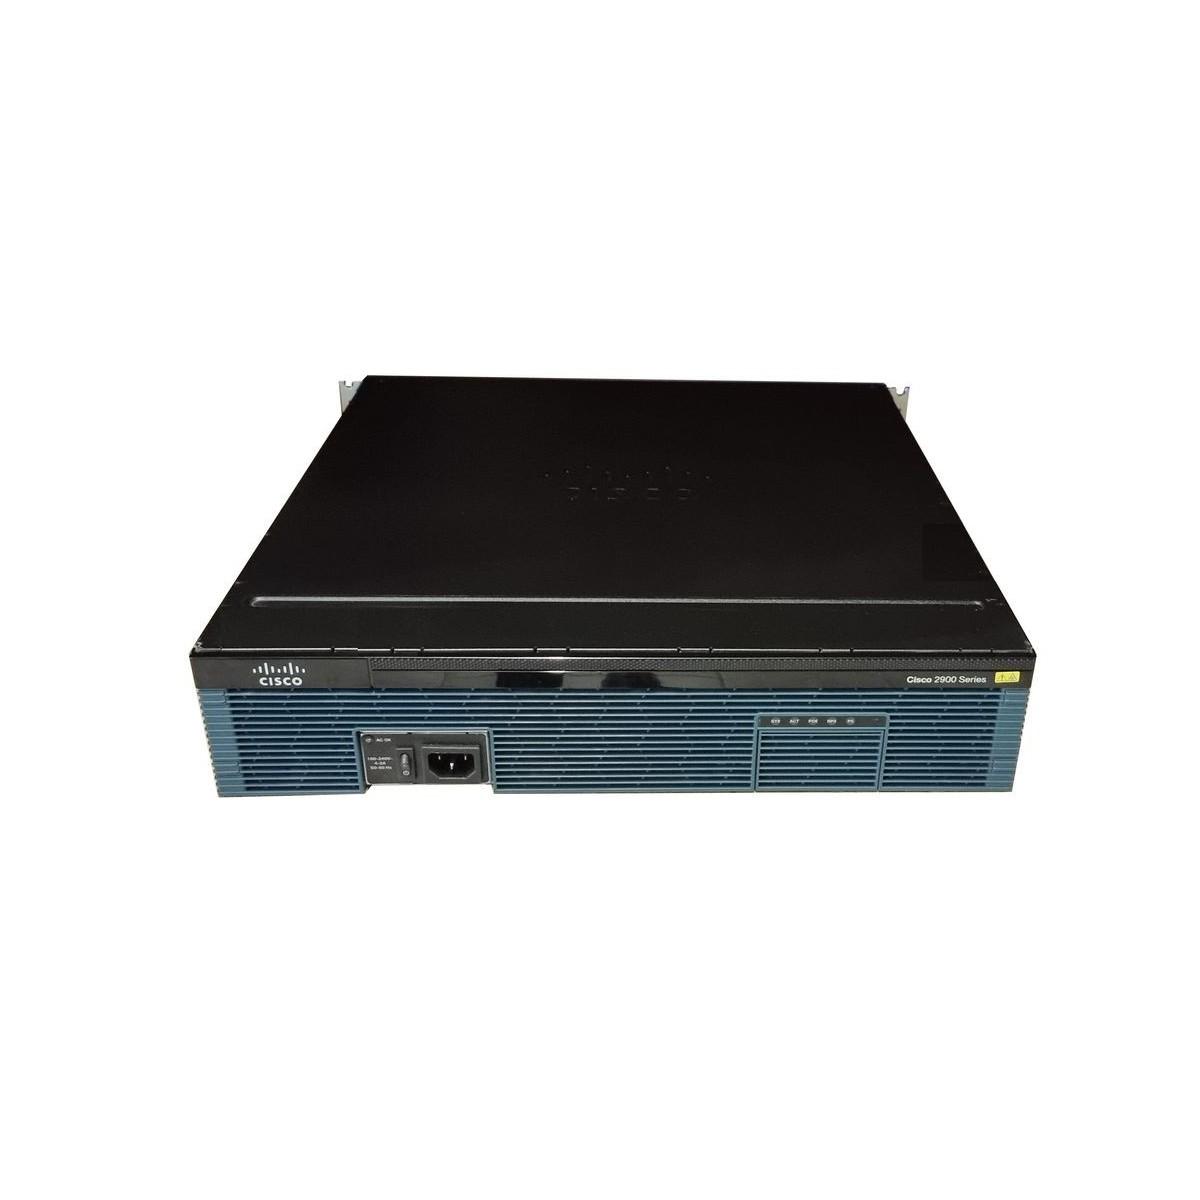 PAMIEC SAMSUNG 1GB 2Rx8 PC2-6400U NON-ECC